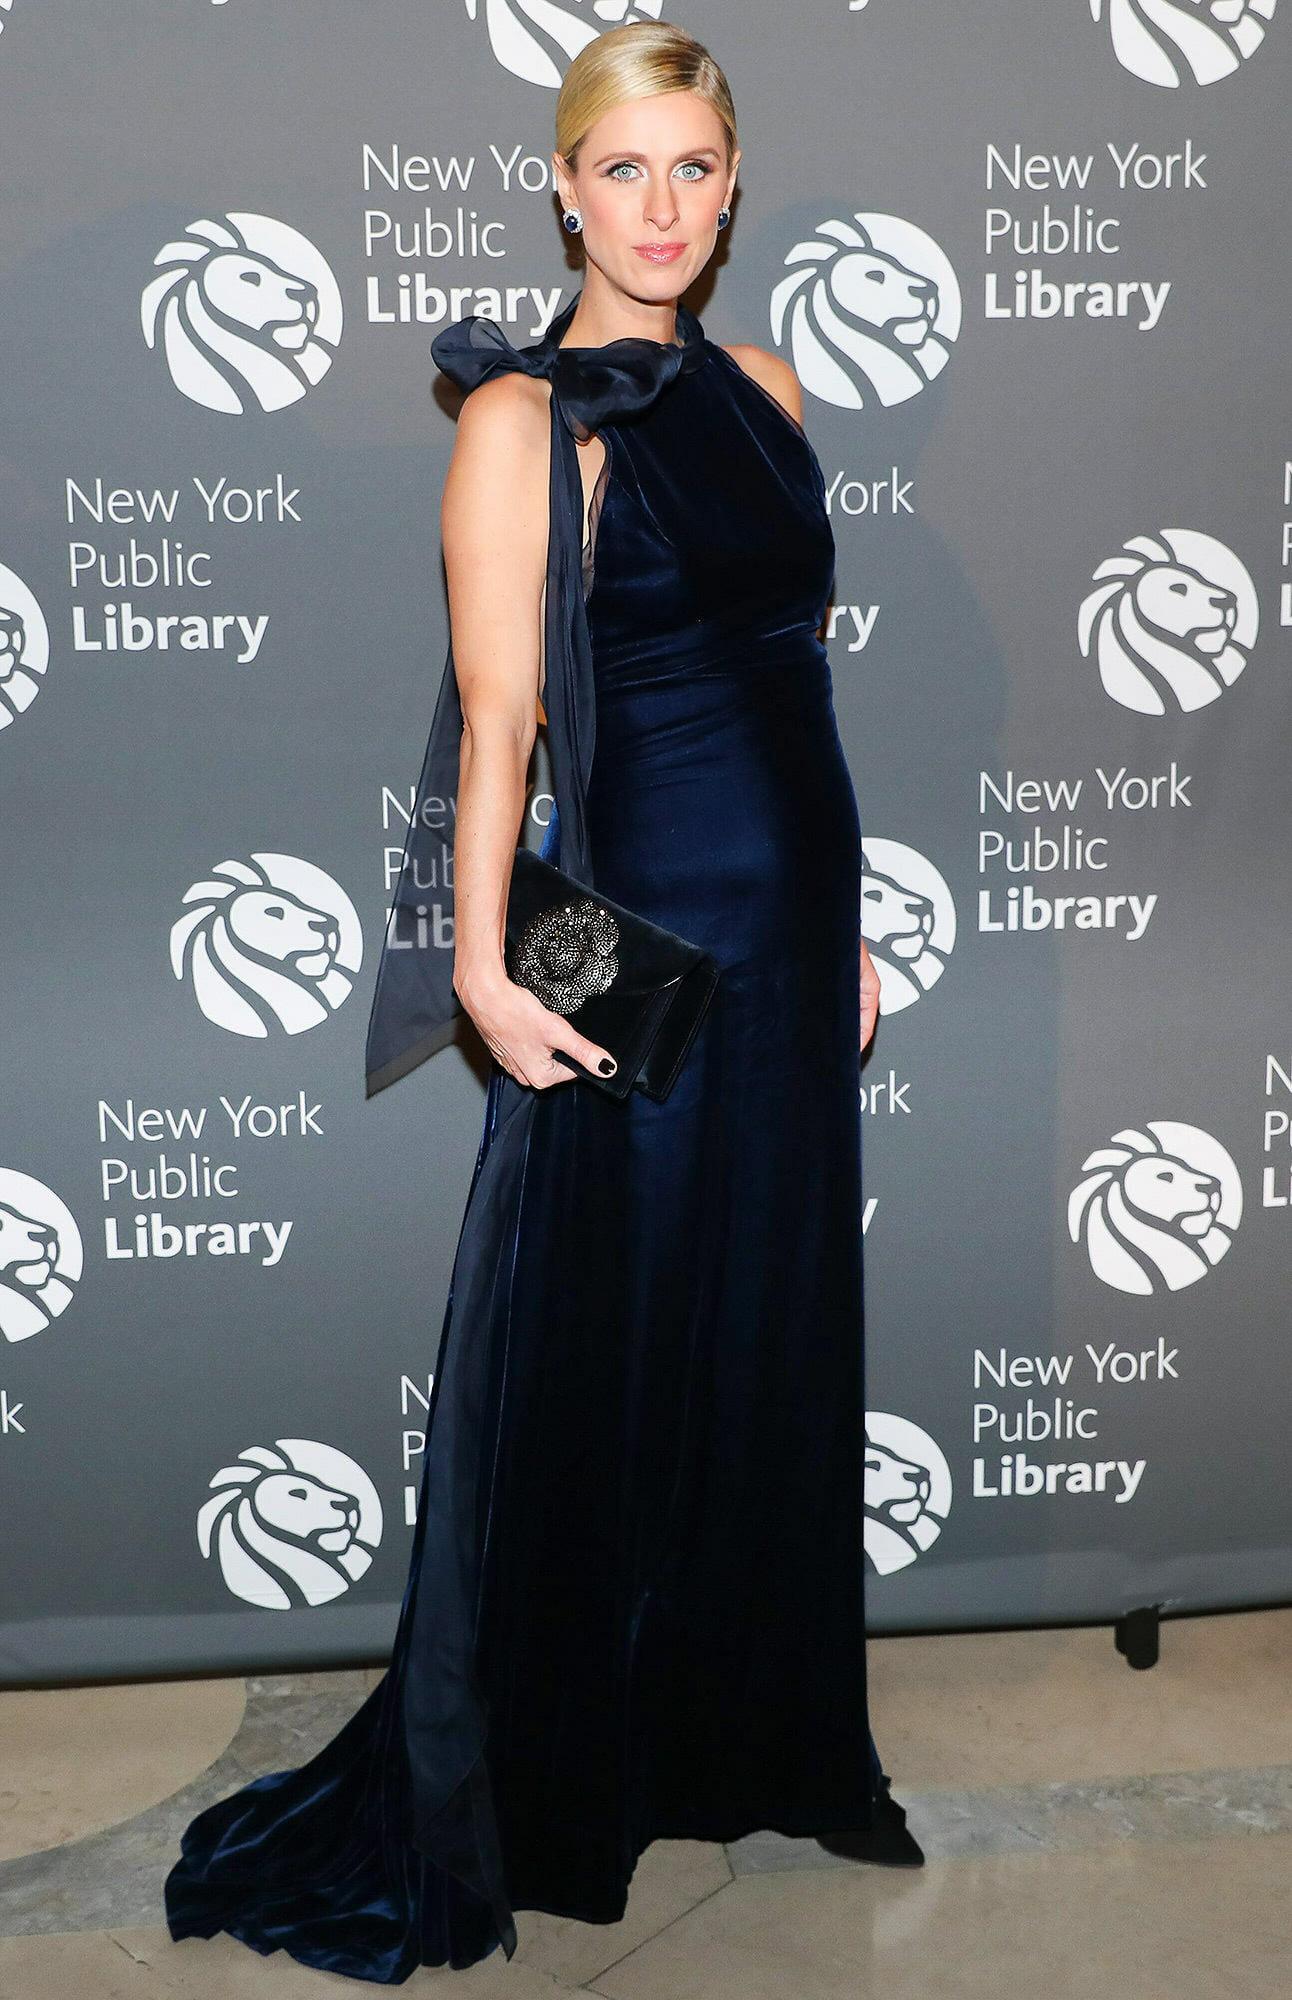 chny-fashion-Nicky-Hilton-wearing-carolina-herrera-dress